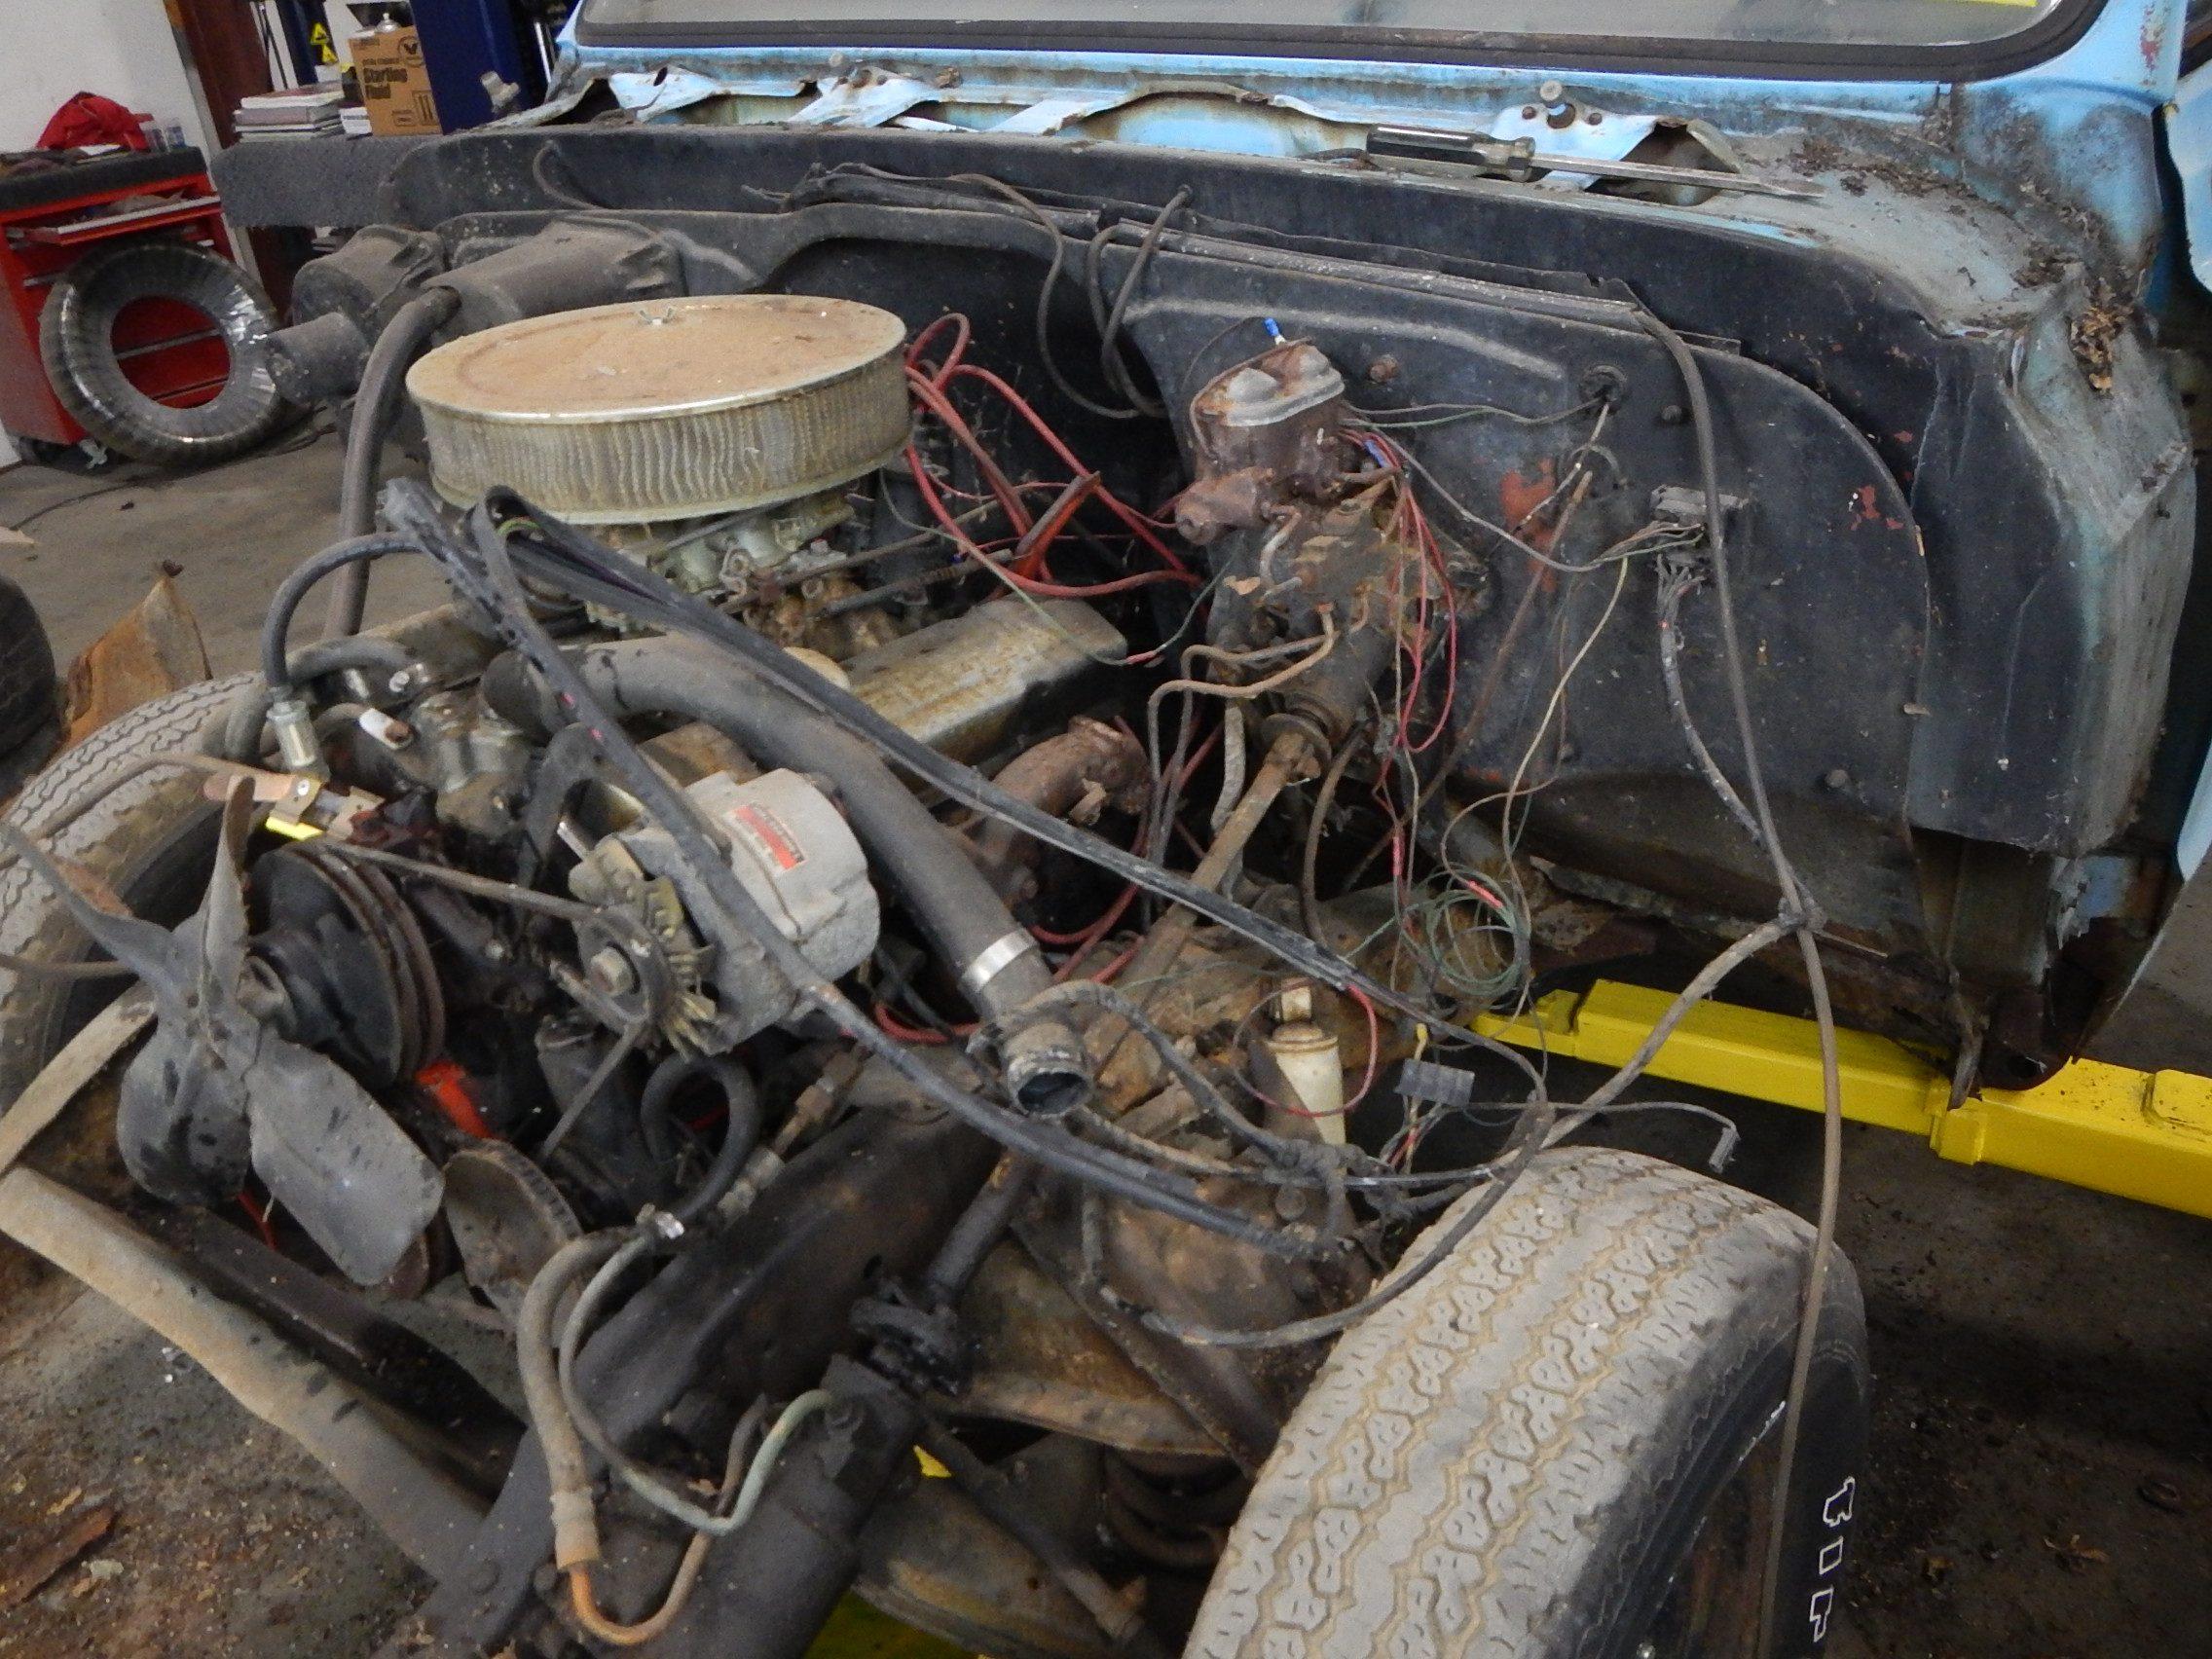 1967 Chevy C-10 restoration 24.jpg